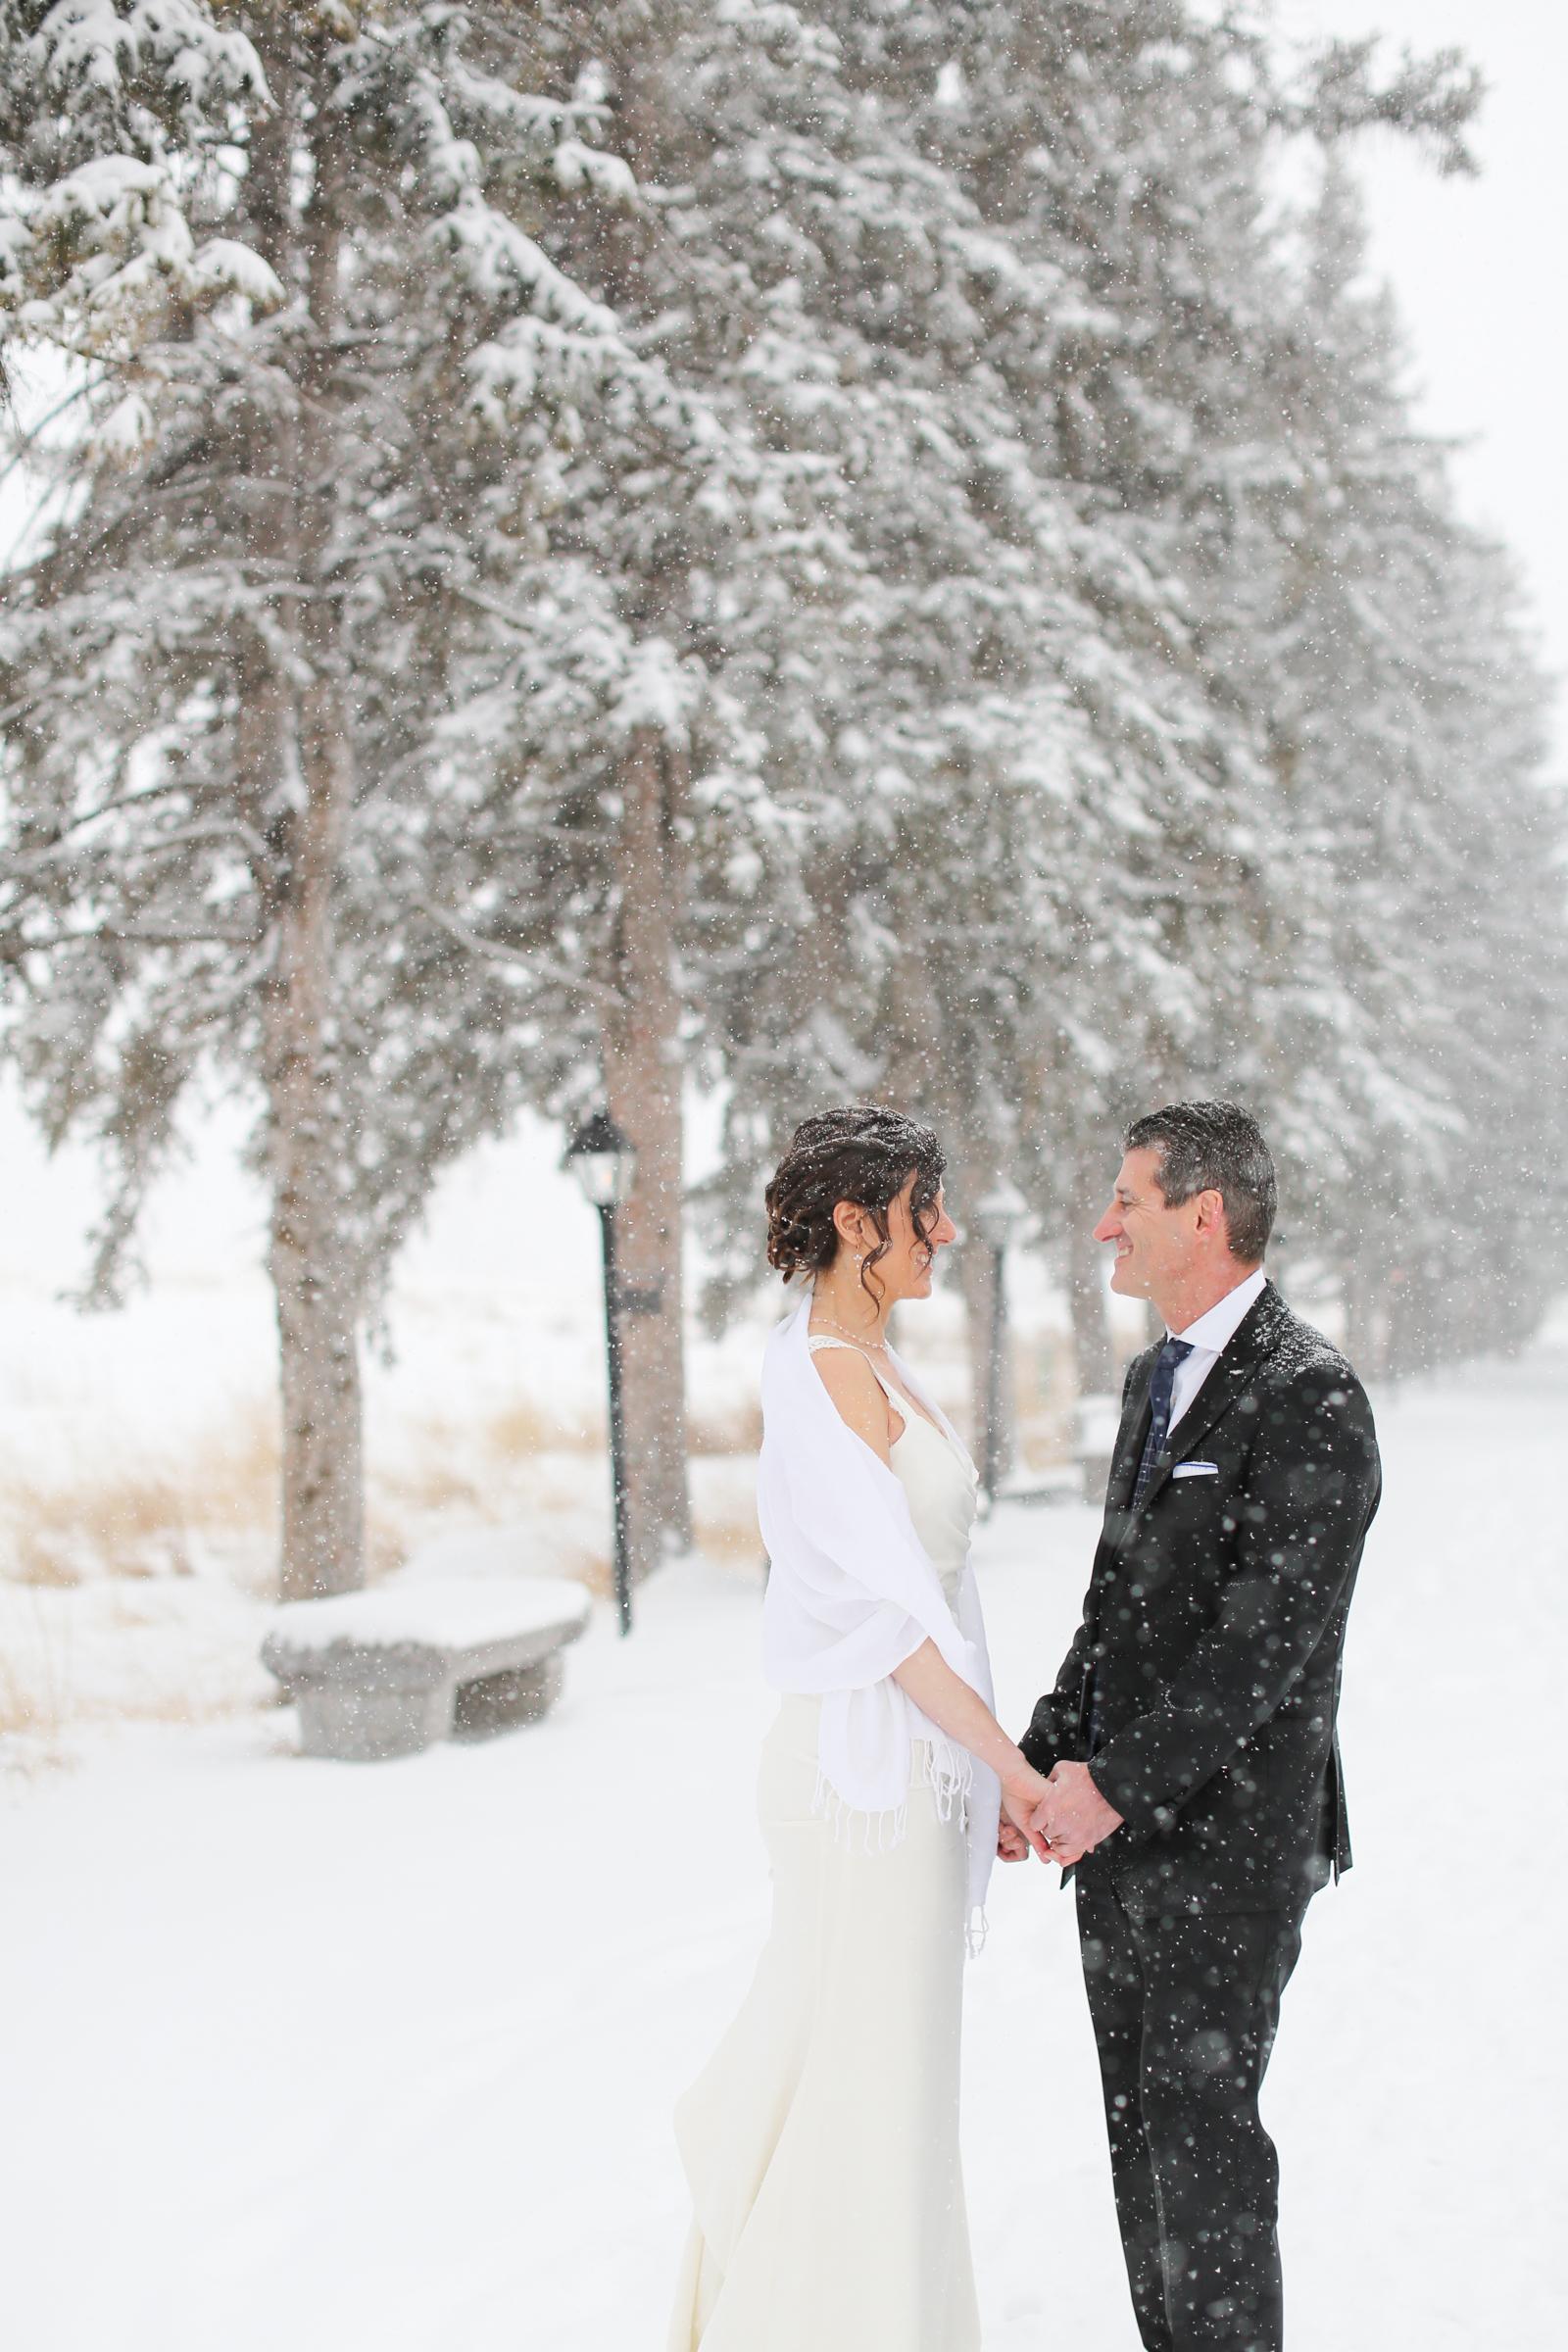 Melanie+Vince-Wedding-35.jpg